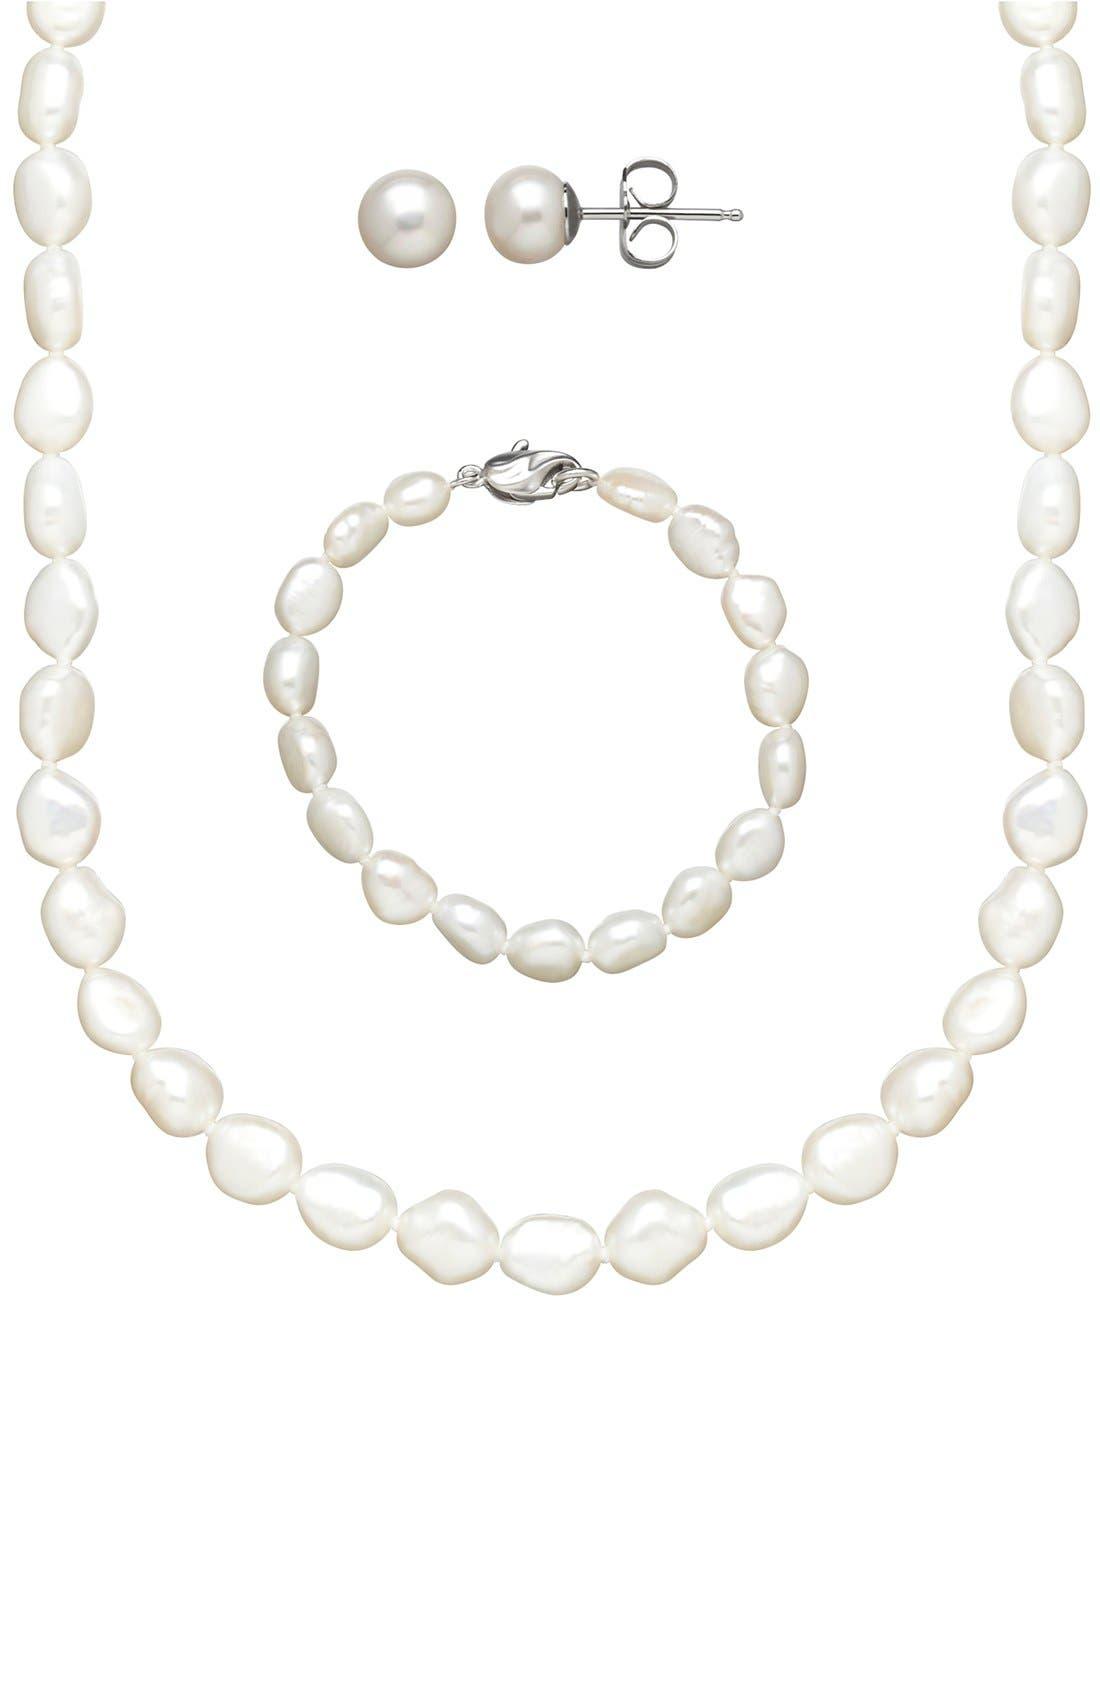 HONORA Freshwater Pearl Necklace, Bracelet & Earrings (Girls)